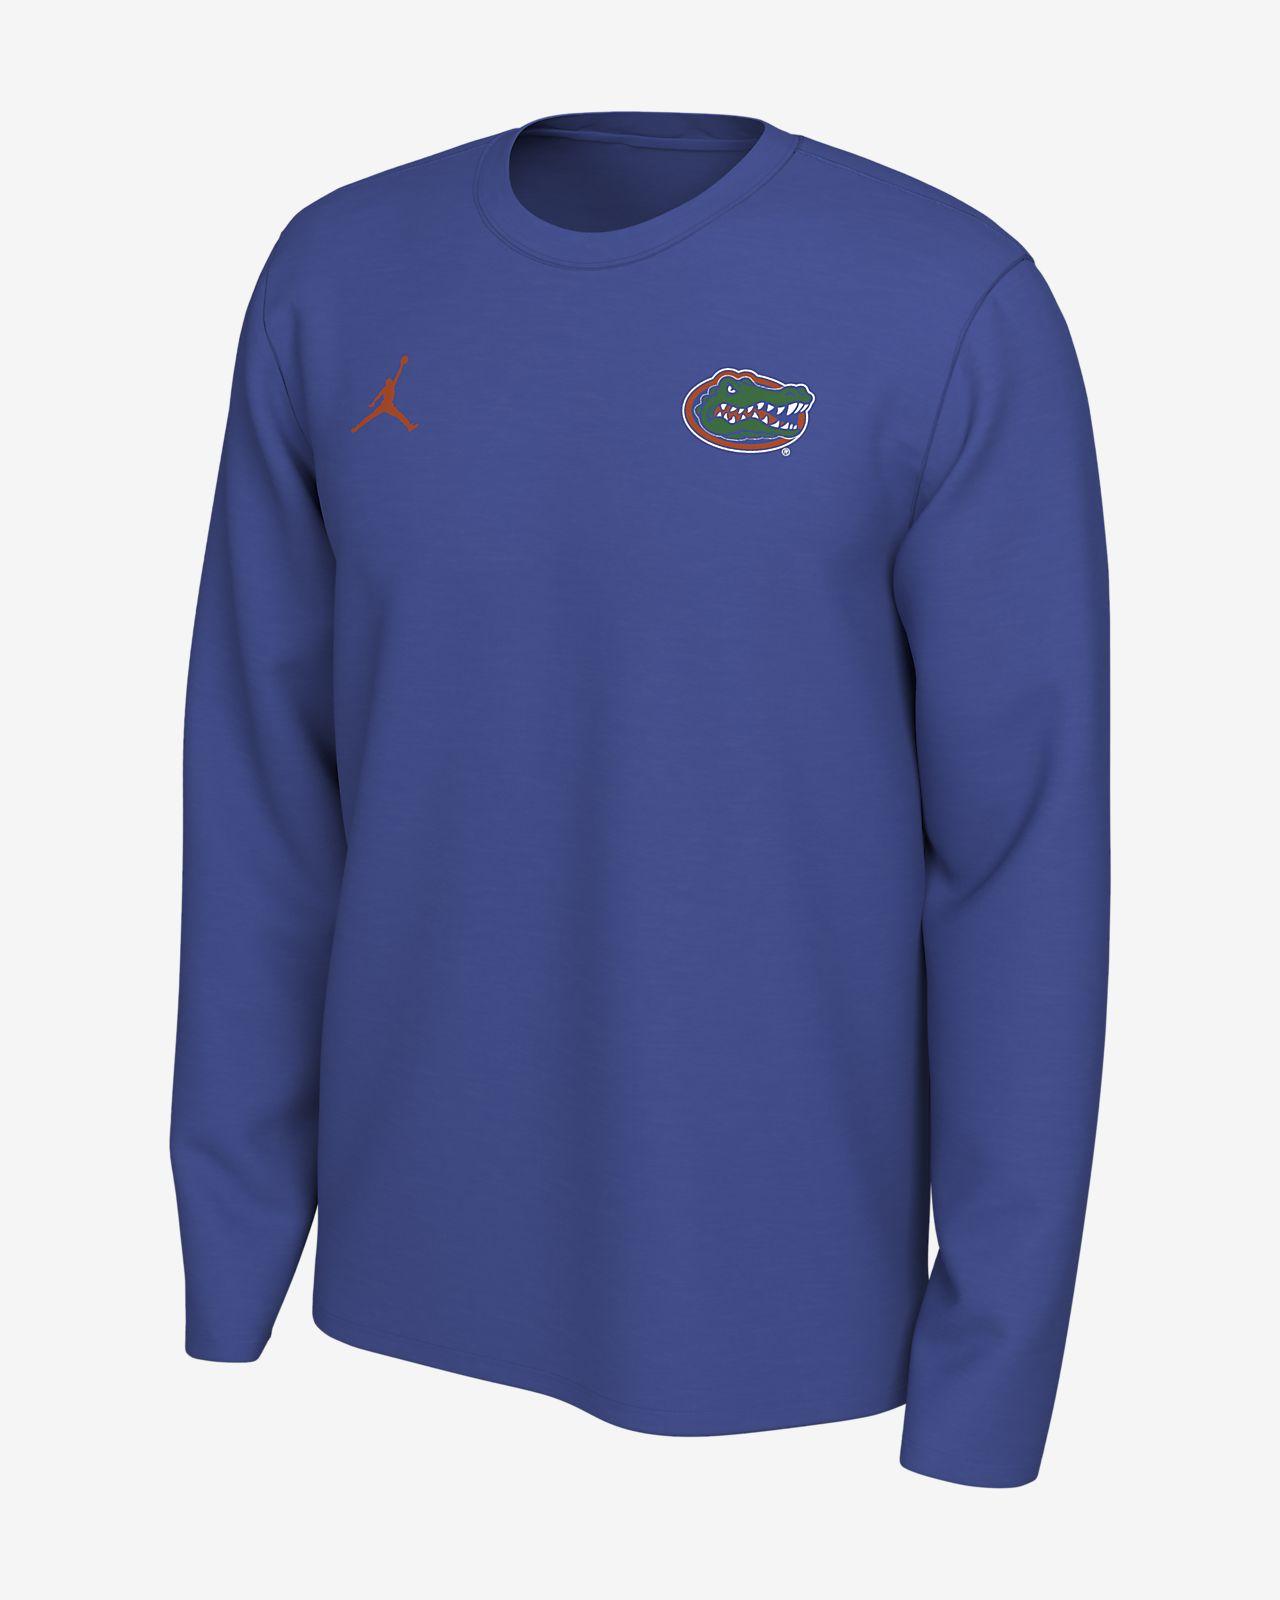 Jordan Legend (Florida) Men's Long-Sleeve Logo T-Shirt